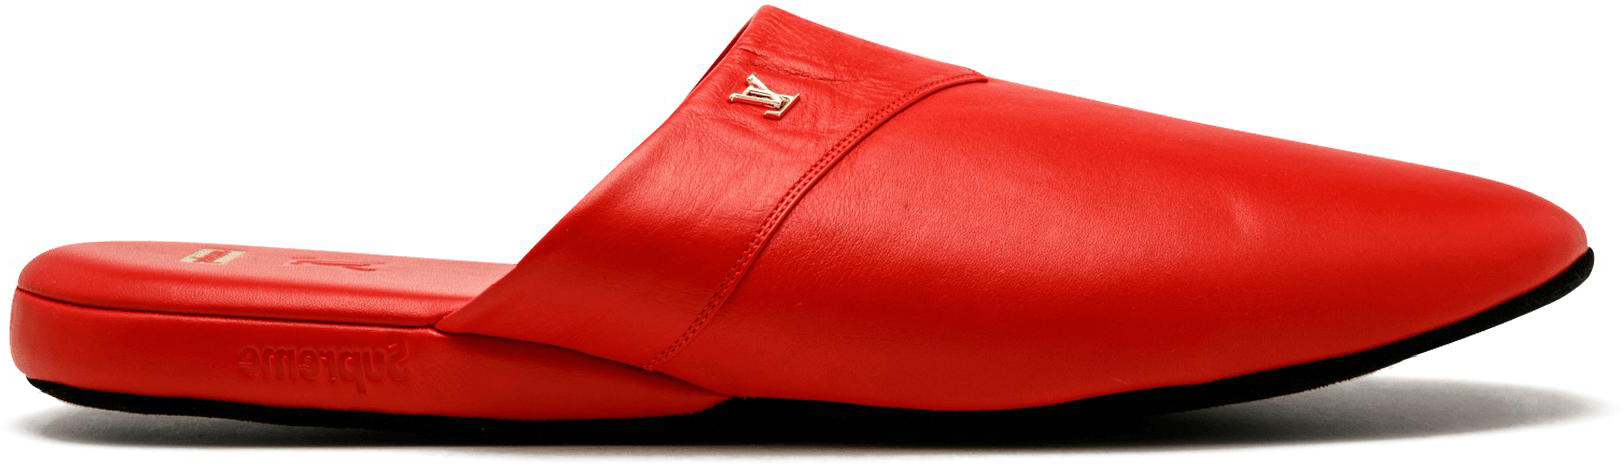 Louis Vuitton Hugh Slipper Supreme Red